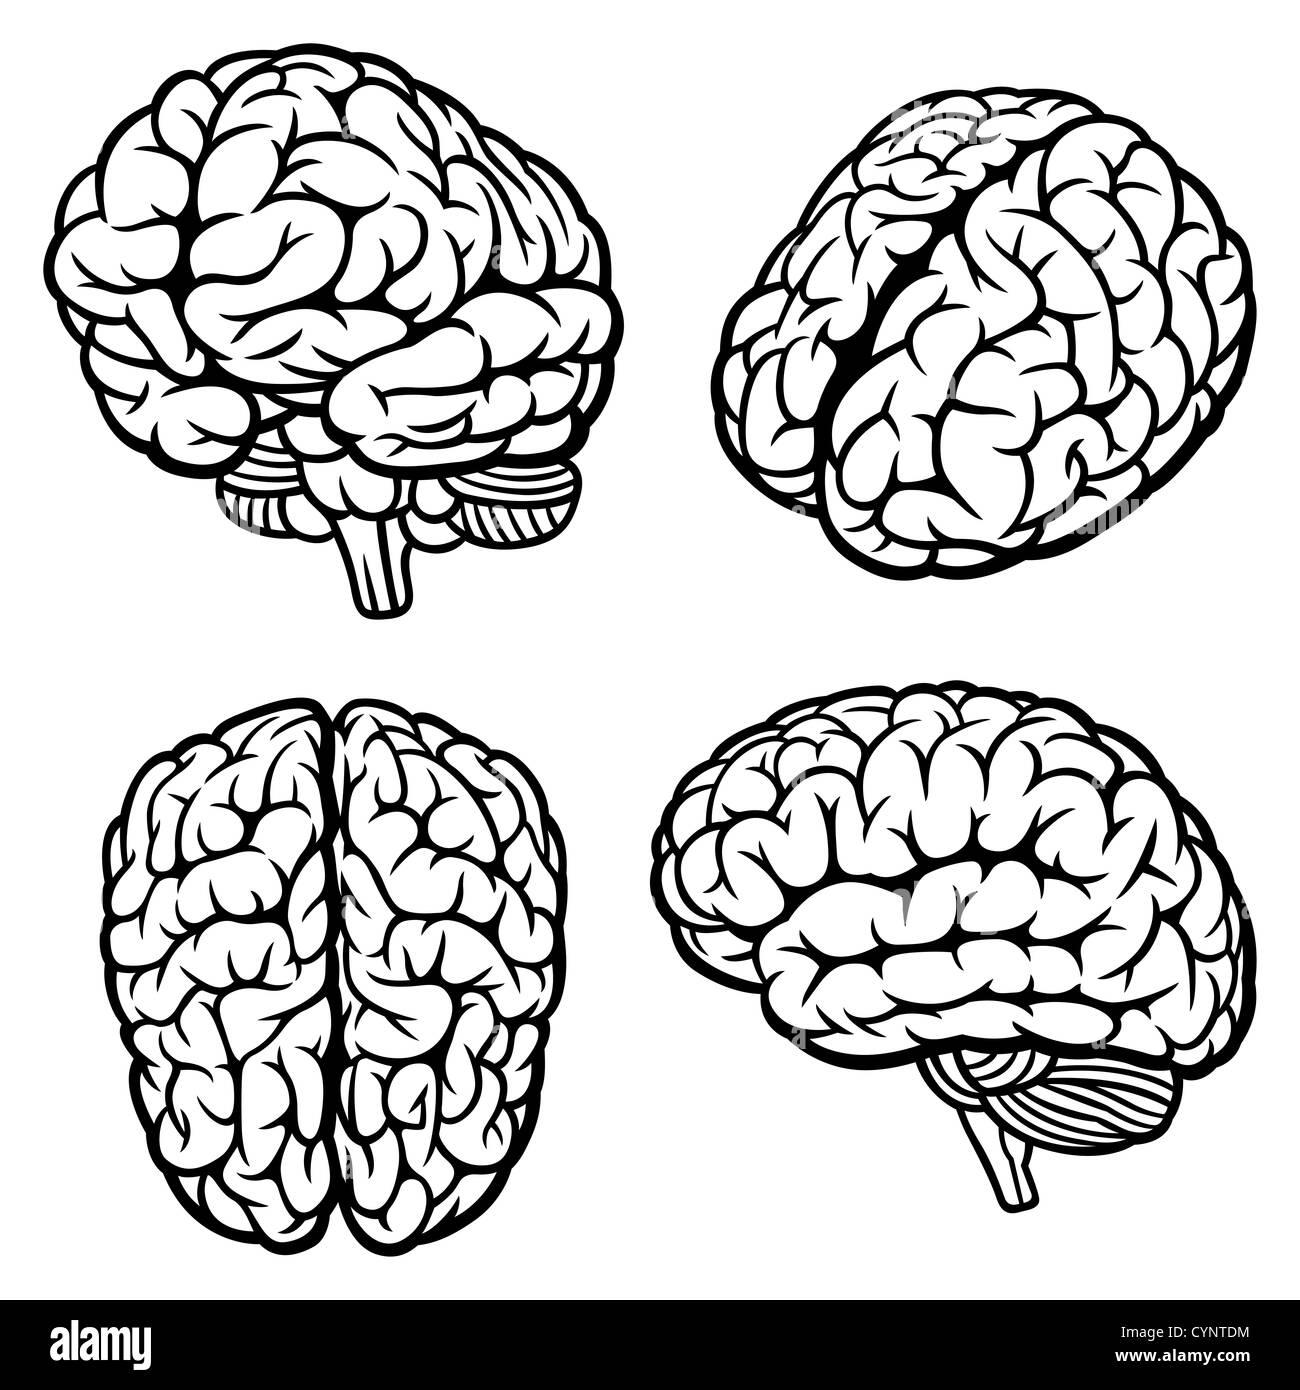 Cerebro humano Foto de stock